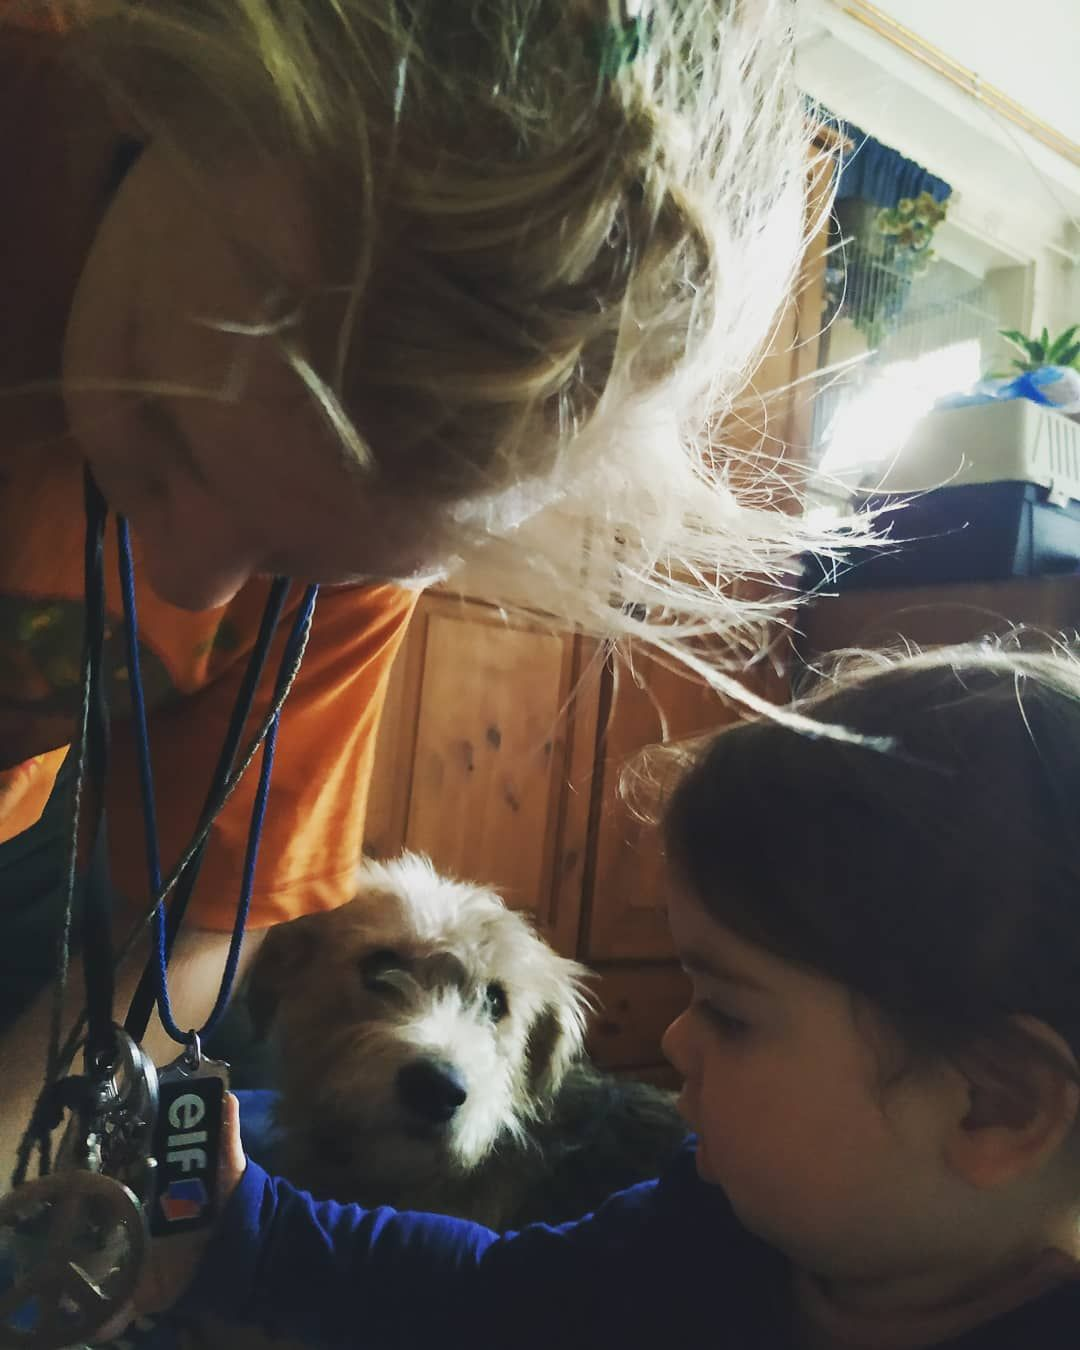 #kids #dogstagram #dogsofinstagram #doglovers #dog